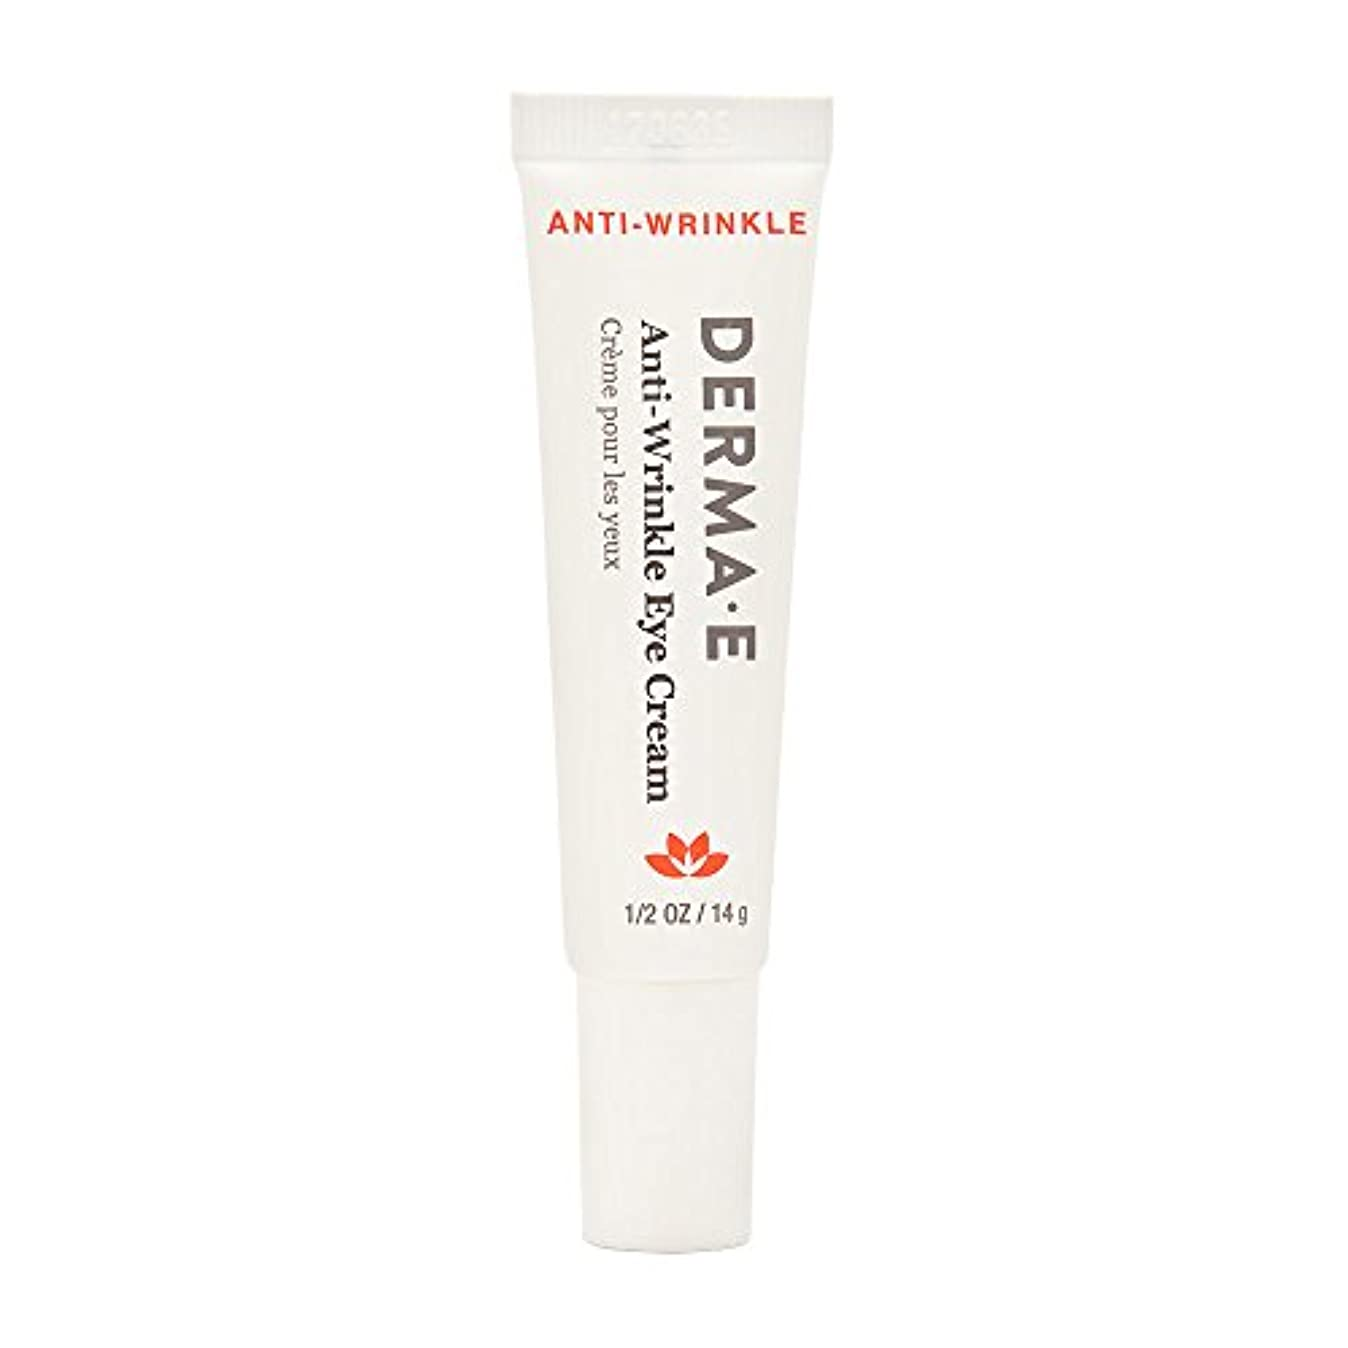 条件付き翻訳債権者Derma E Beauty - Anti-Wrinkle Eye Cream - 0.5oz / 14g